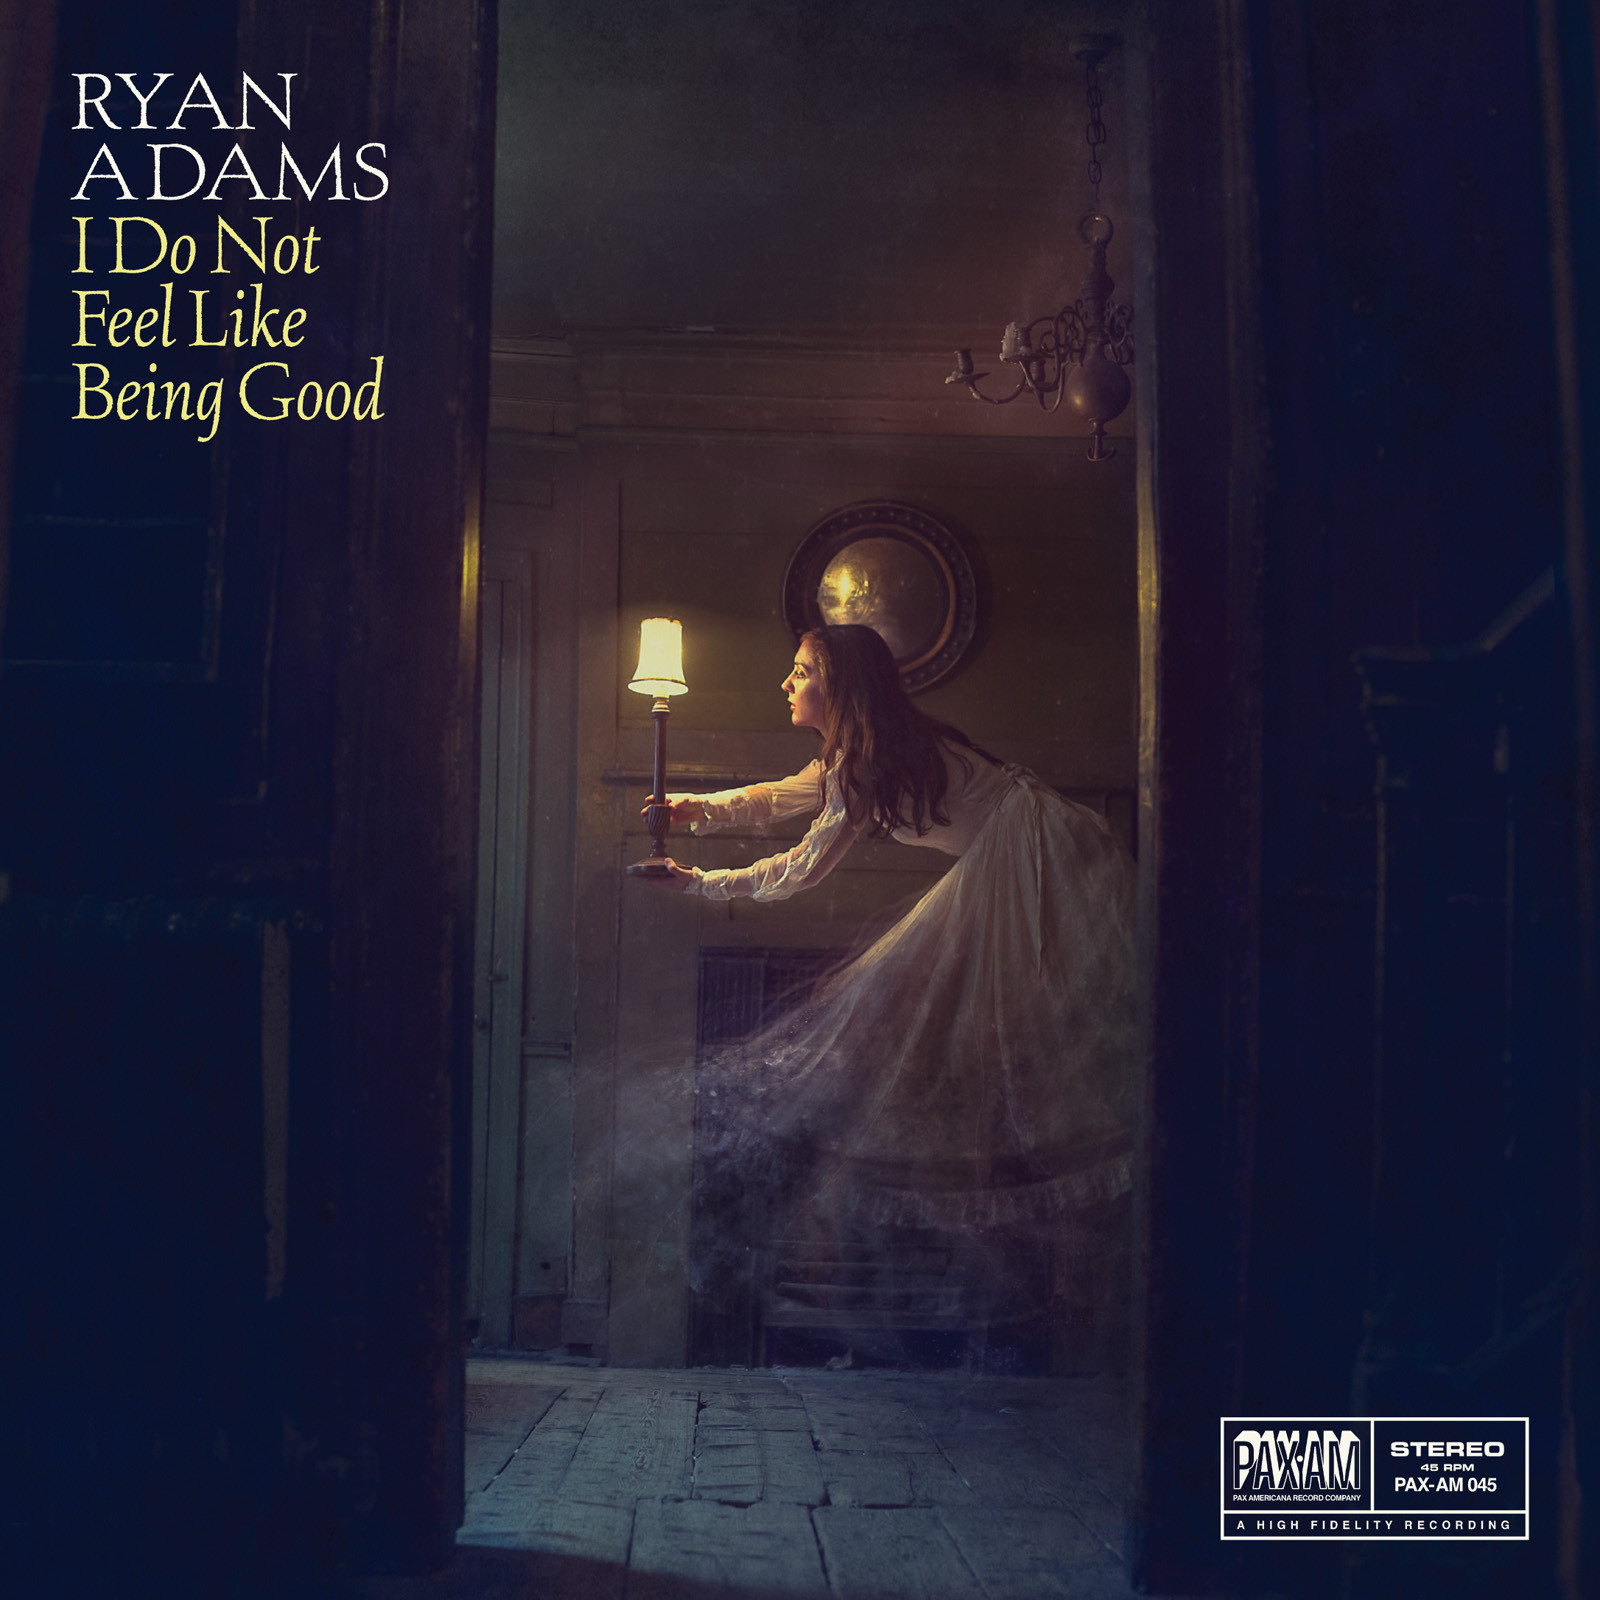 Ryan Adams - I Do Not Feel Like Being Good